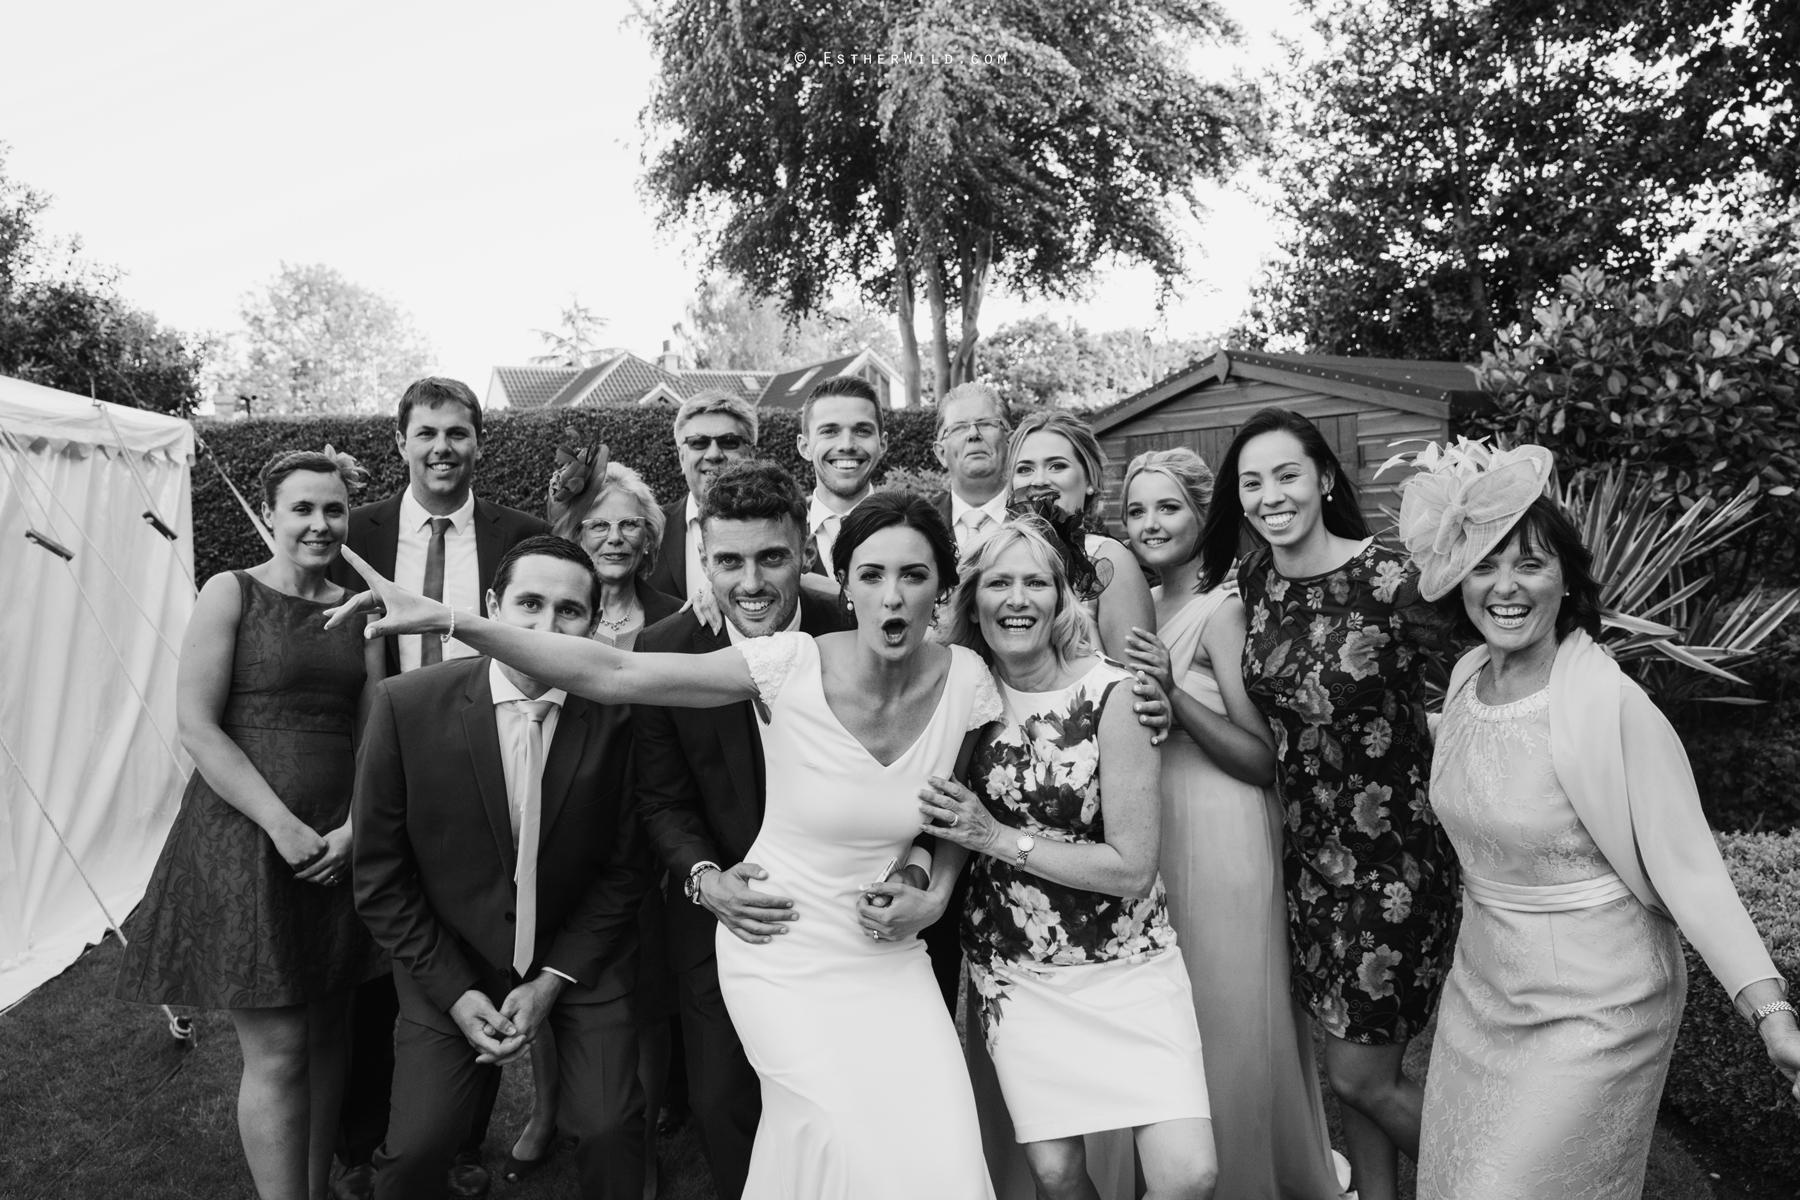 Wootton_Wedding_Copyright_Esther_Wild_Photographer_IMG_2213-1.jpg